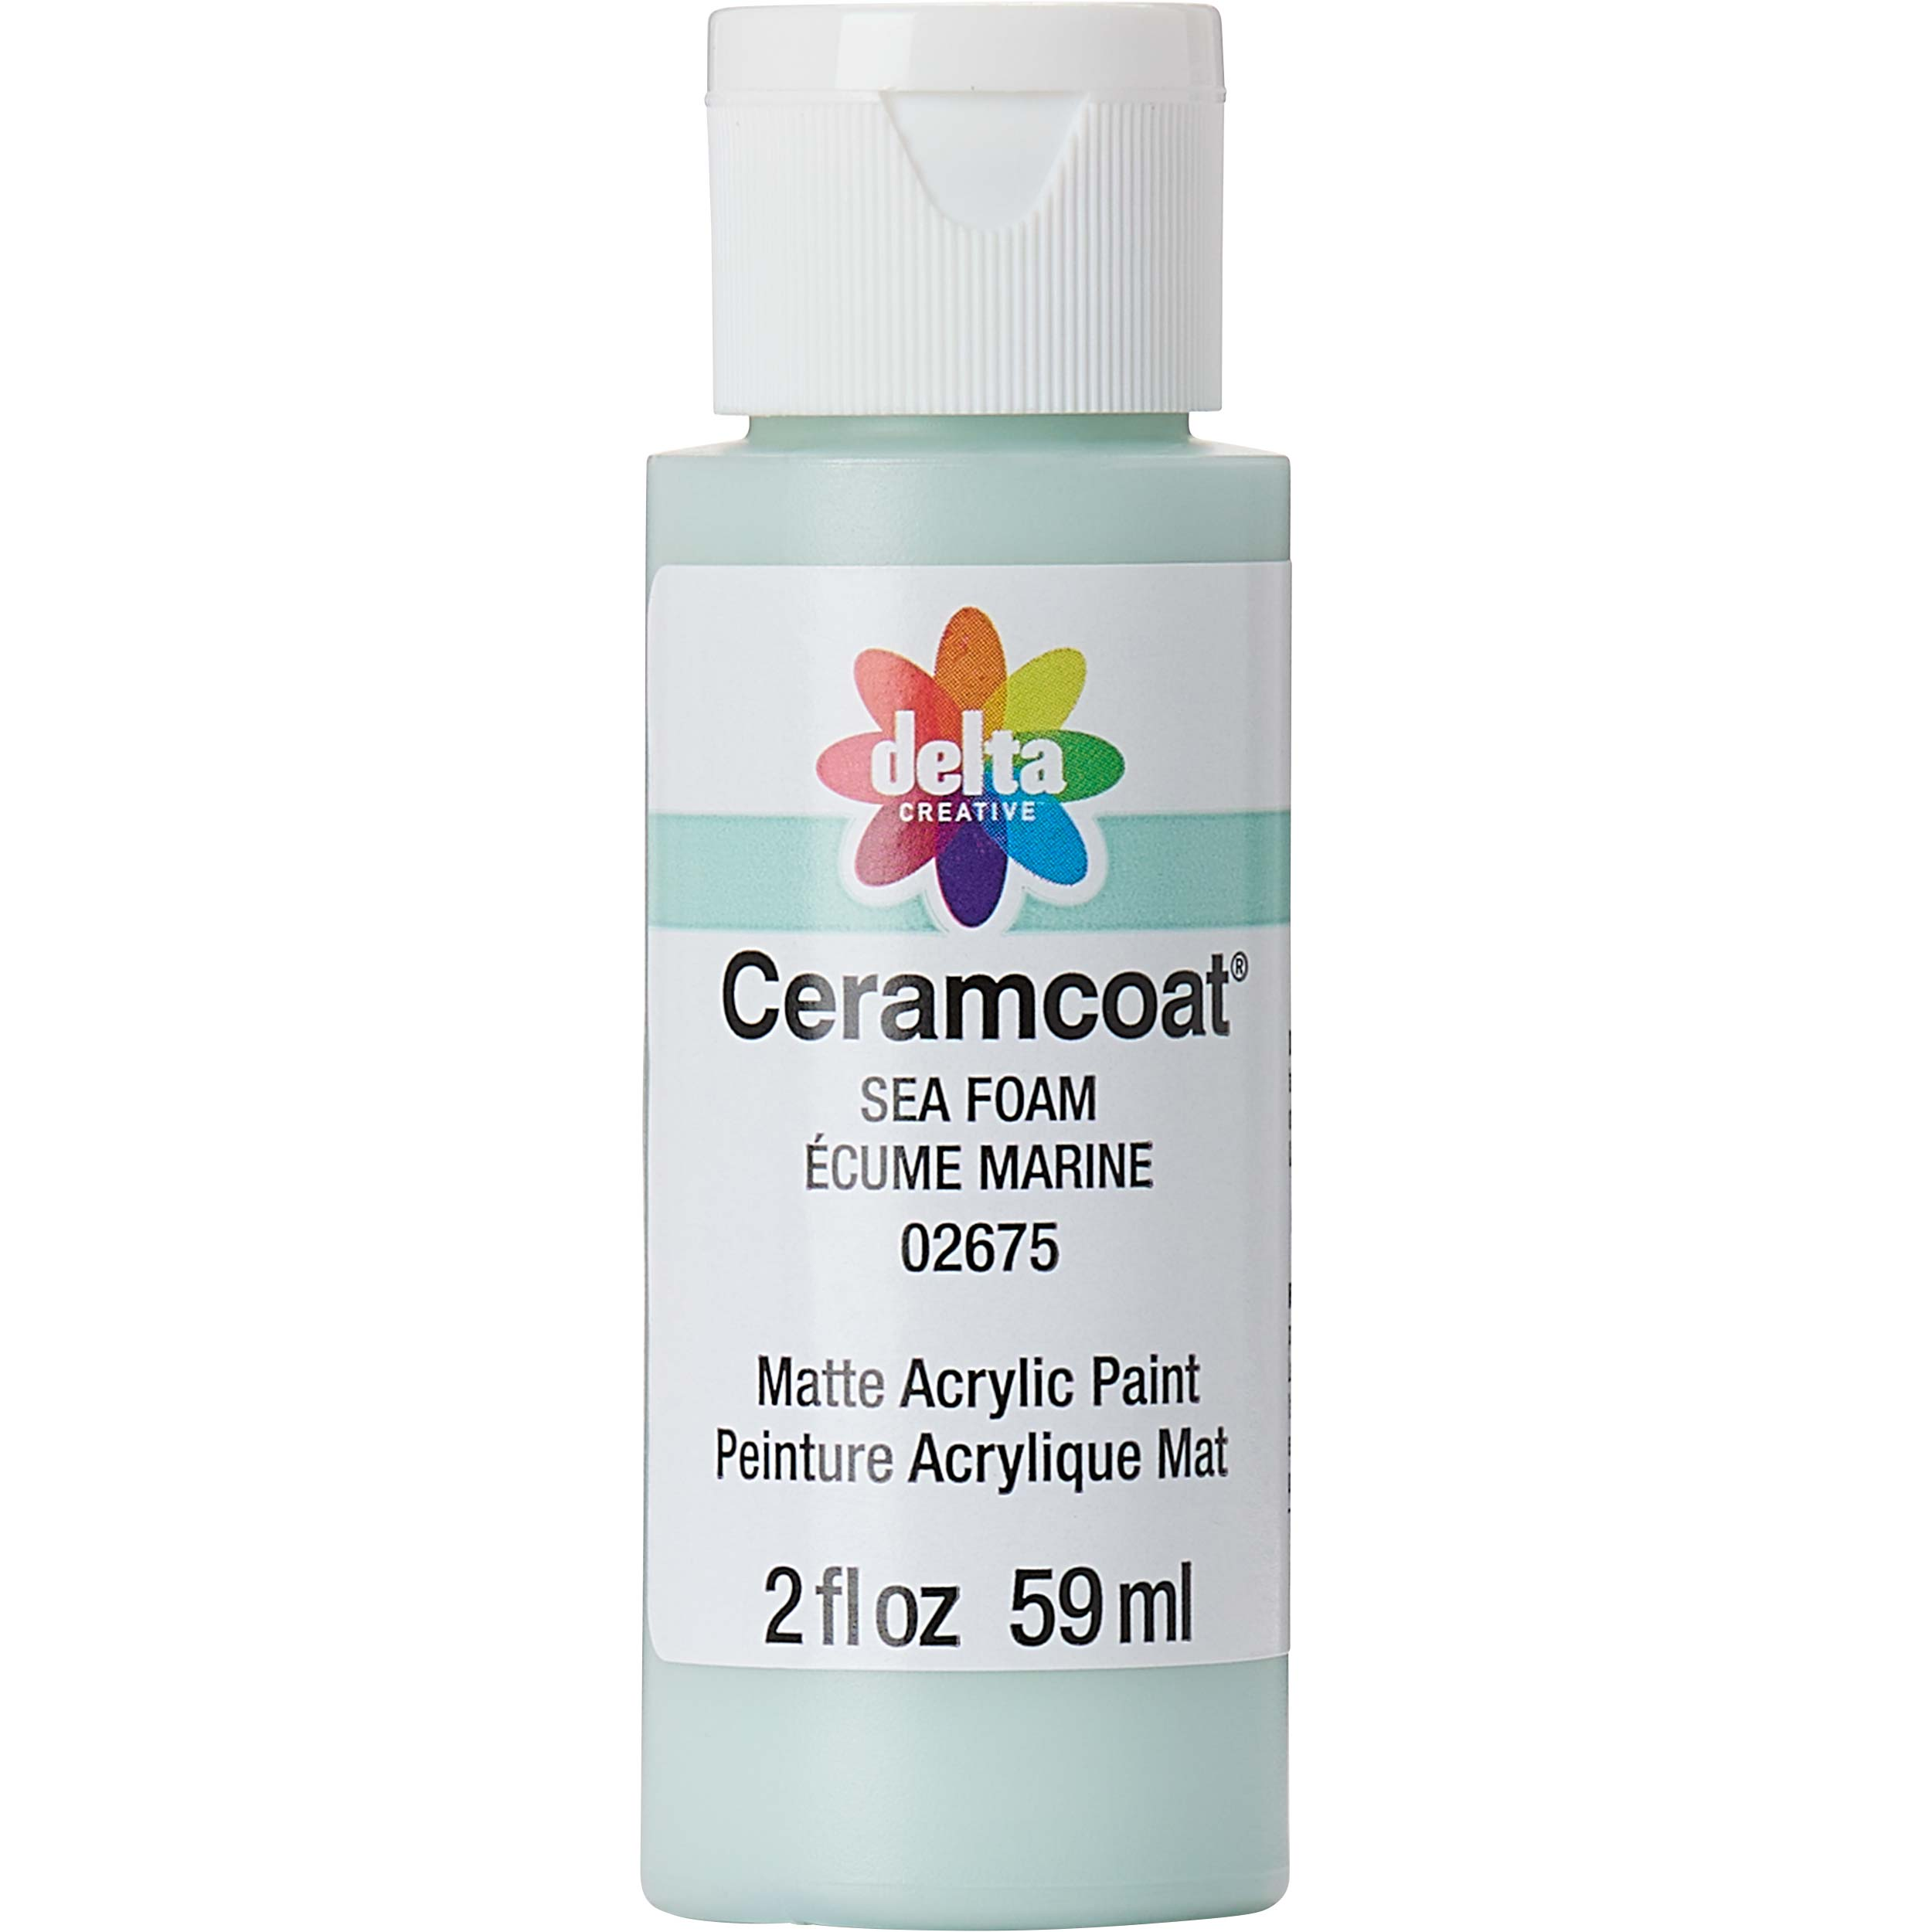 Delta Ceramcoat ® Acrylic Paint - Sea Foam, 2 oz.